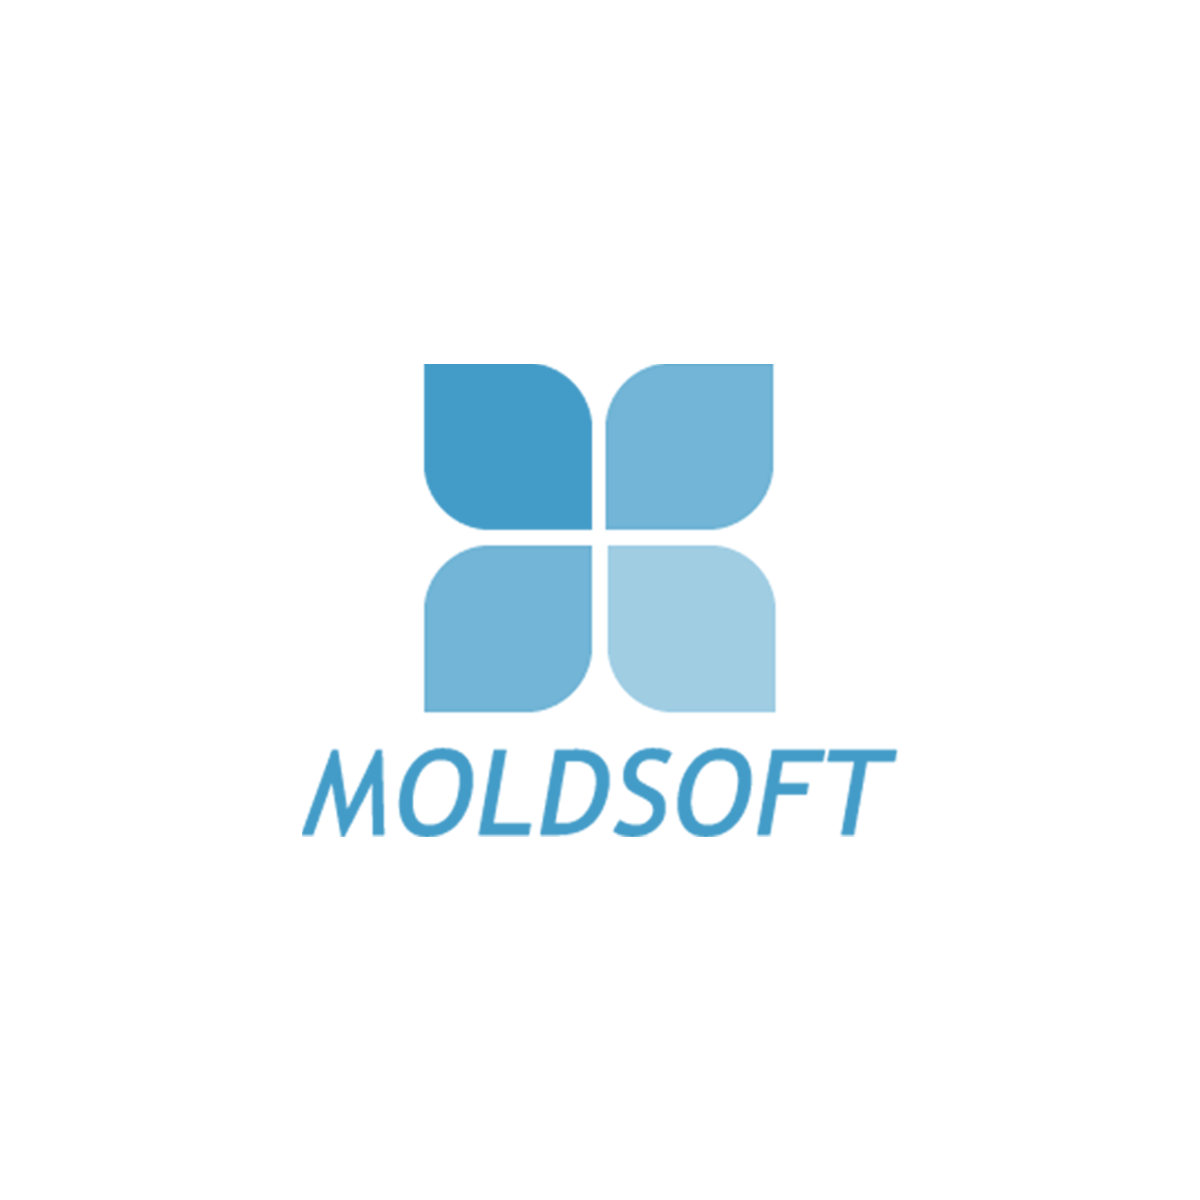 moldsoft